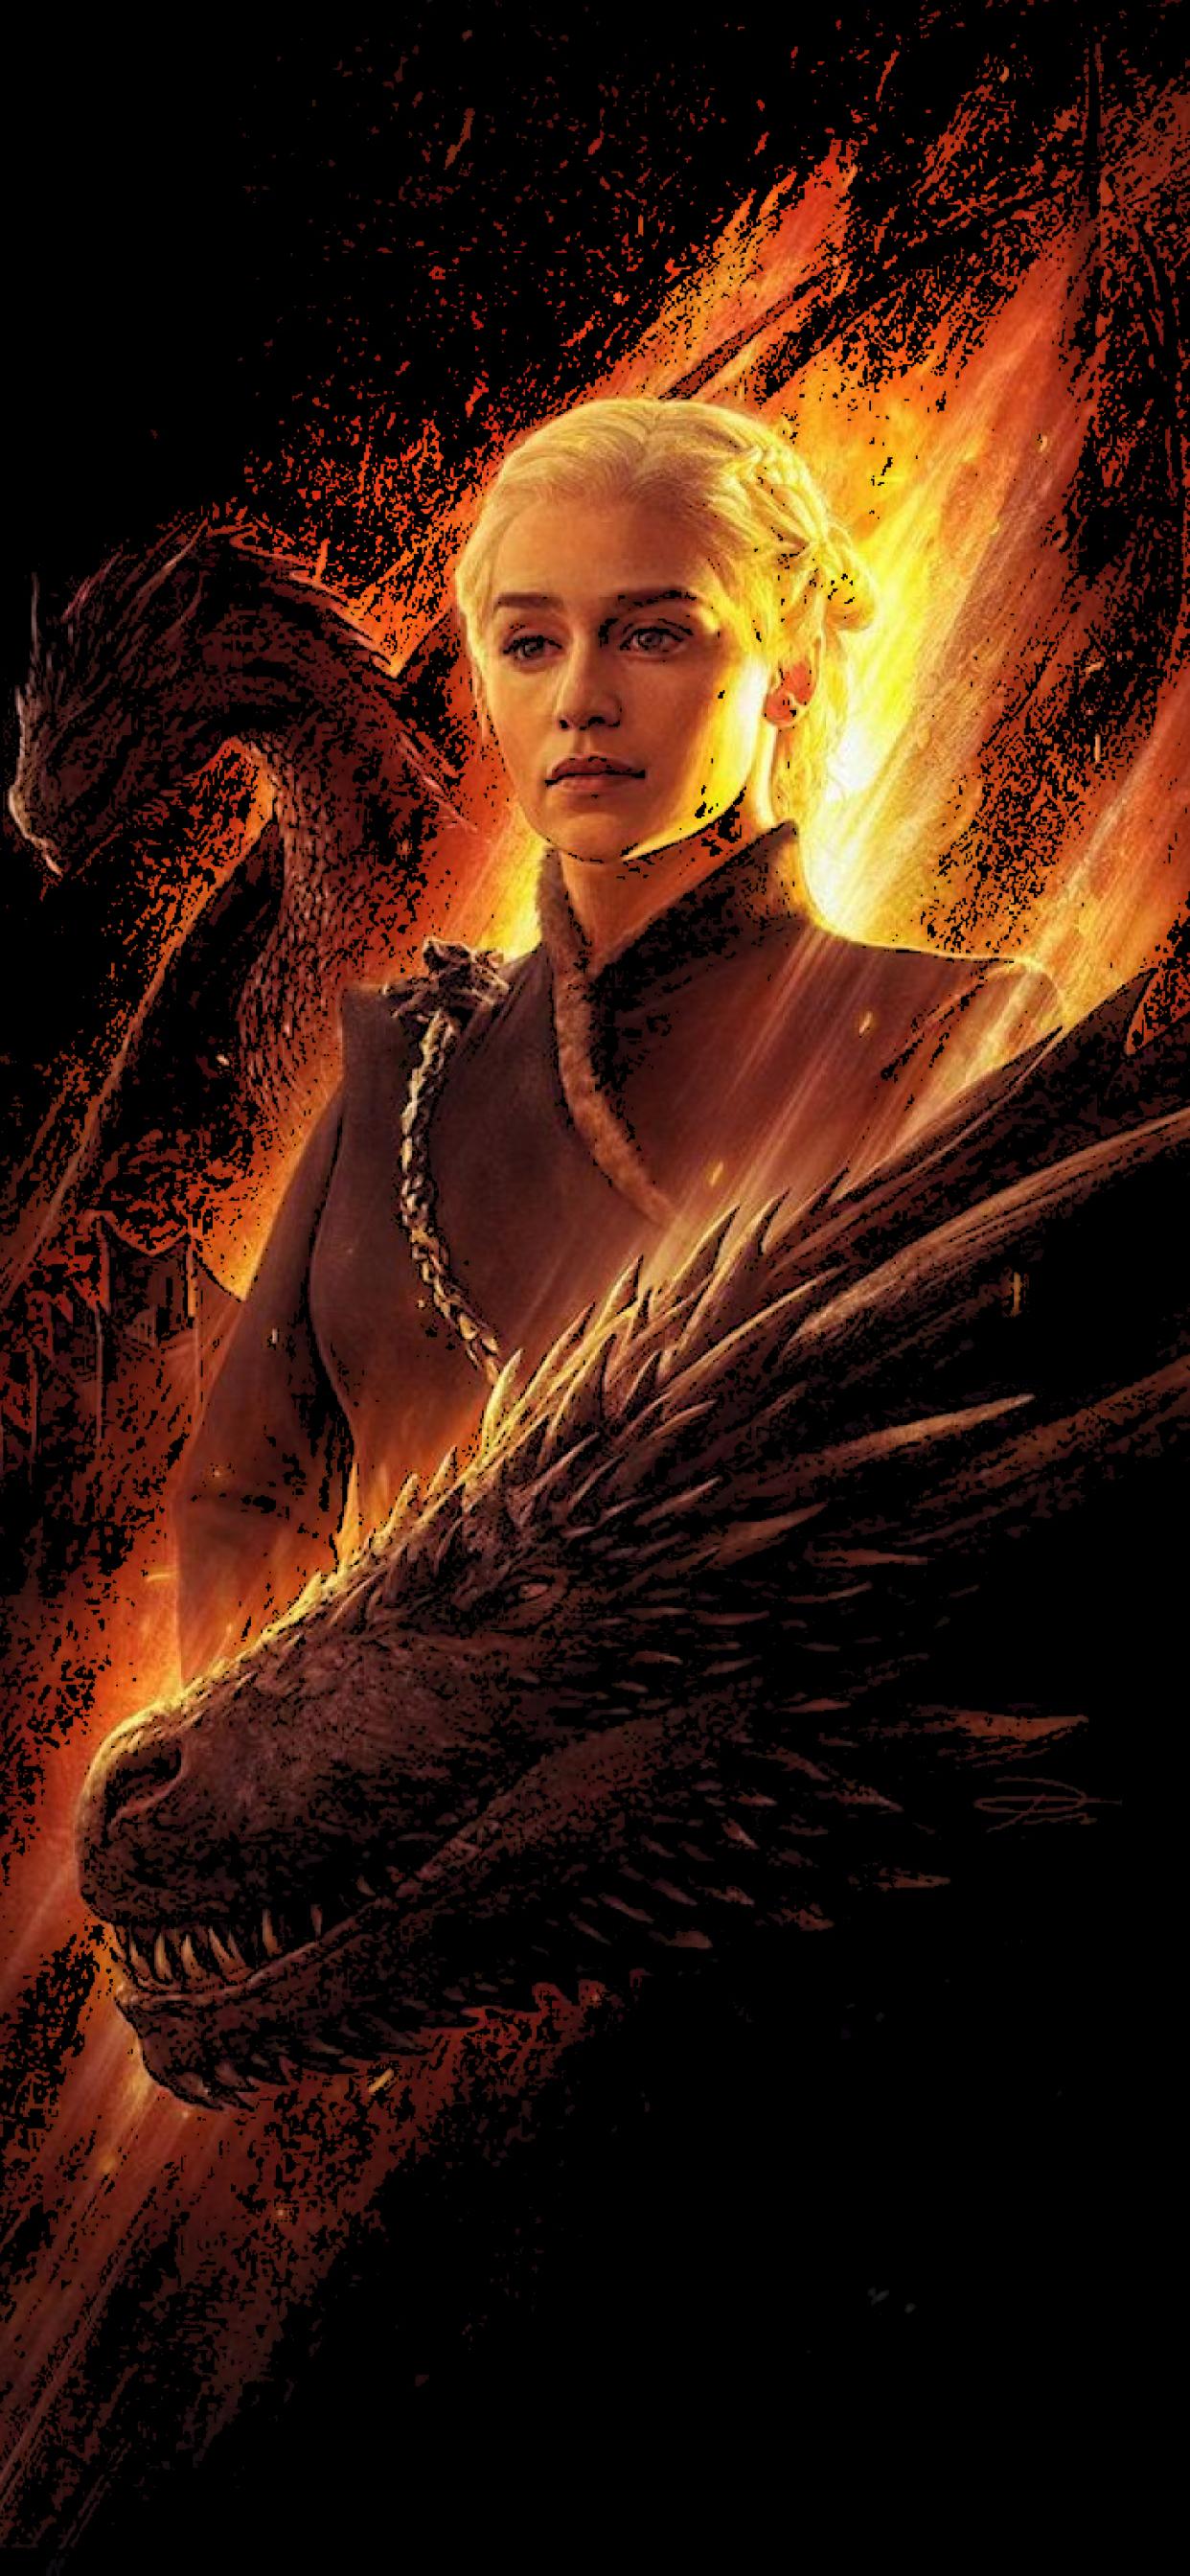 1242x2688 Daenerys And Dragons Iphone Xs Max Wallpaper Hd